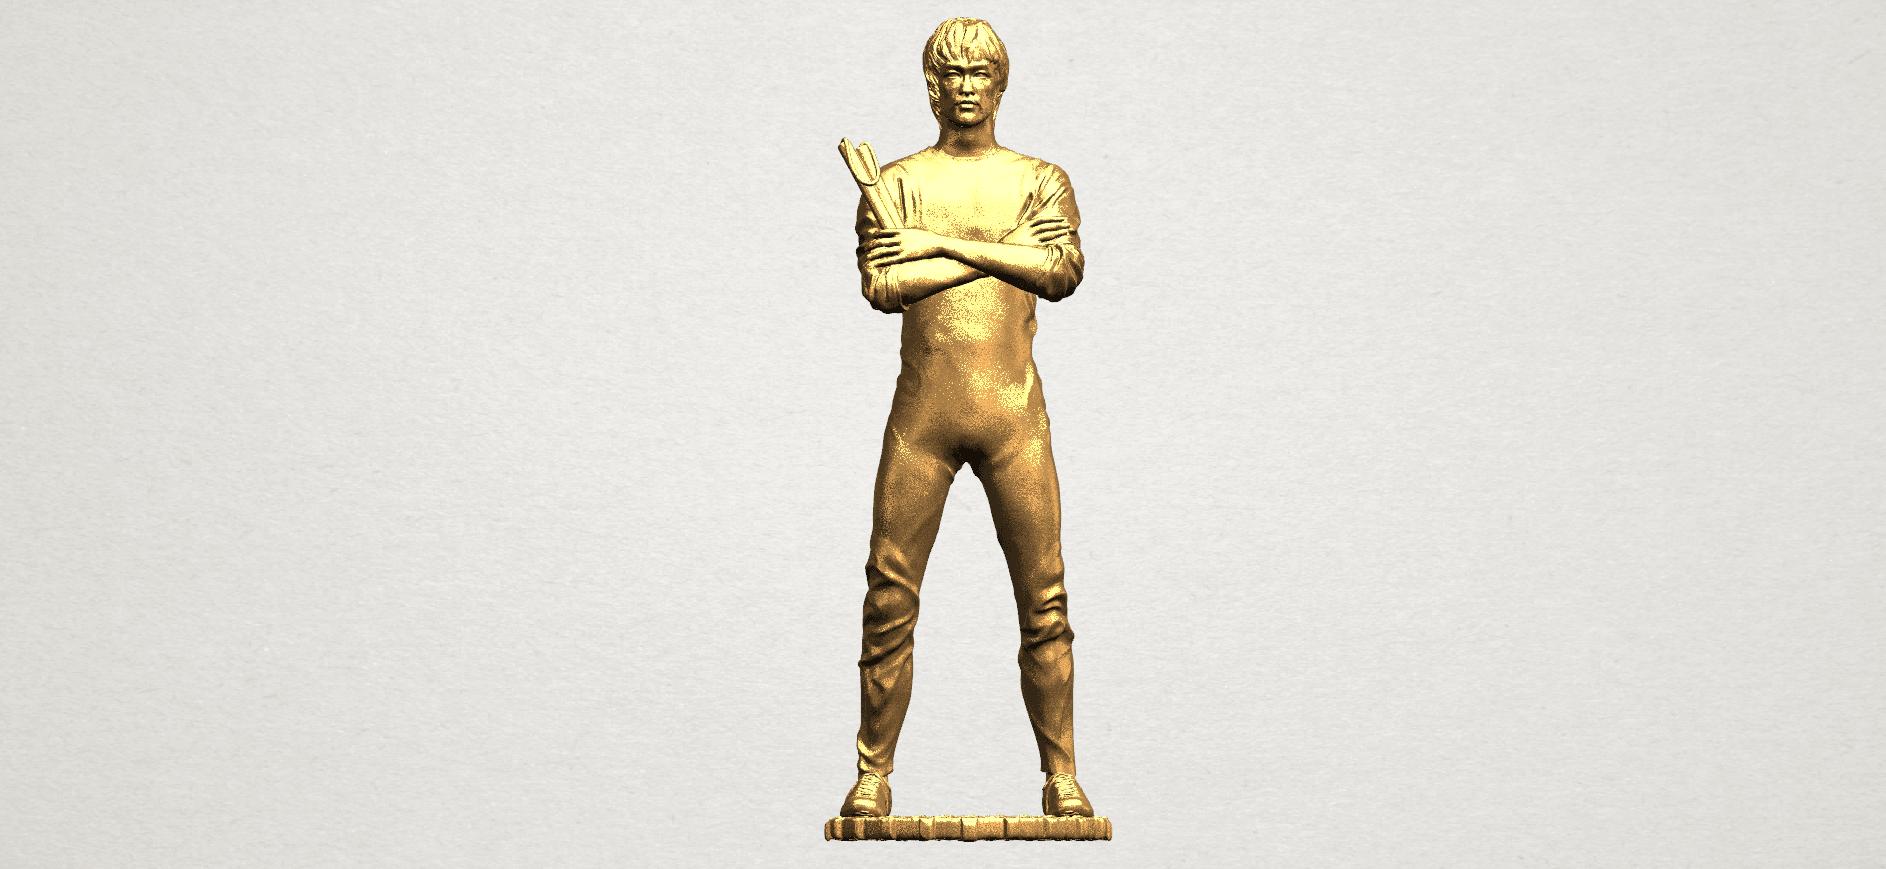 Bruce Lee A01.png Download free STL file Bruce Lee • 3D printing design, GeorgesNikkei